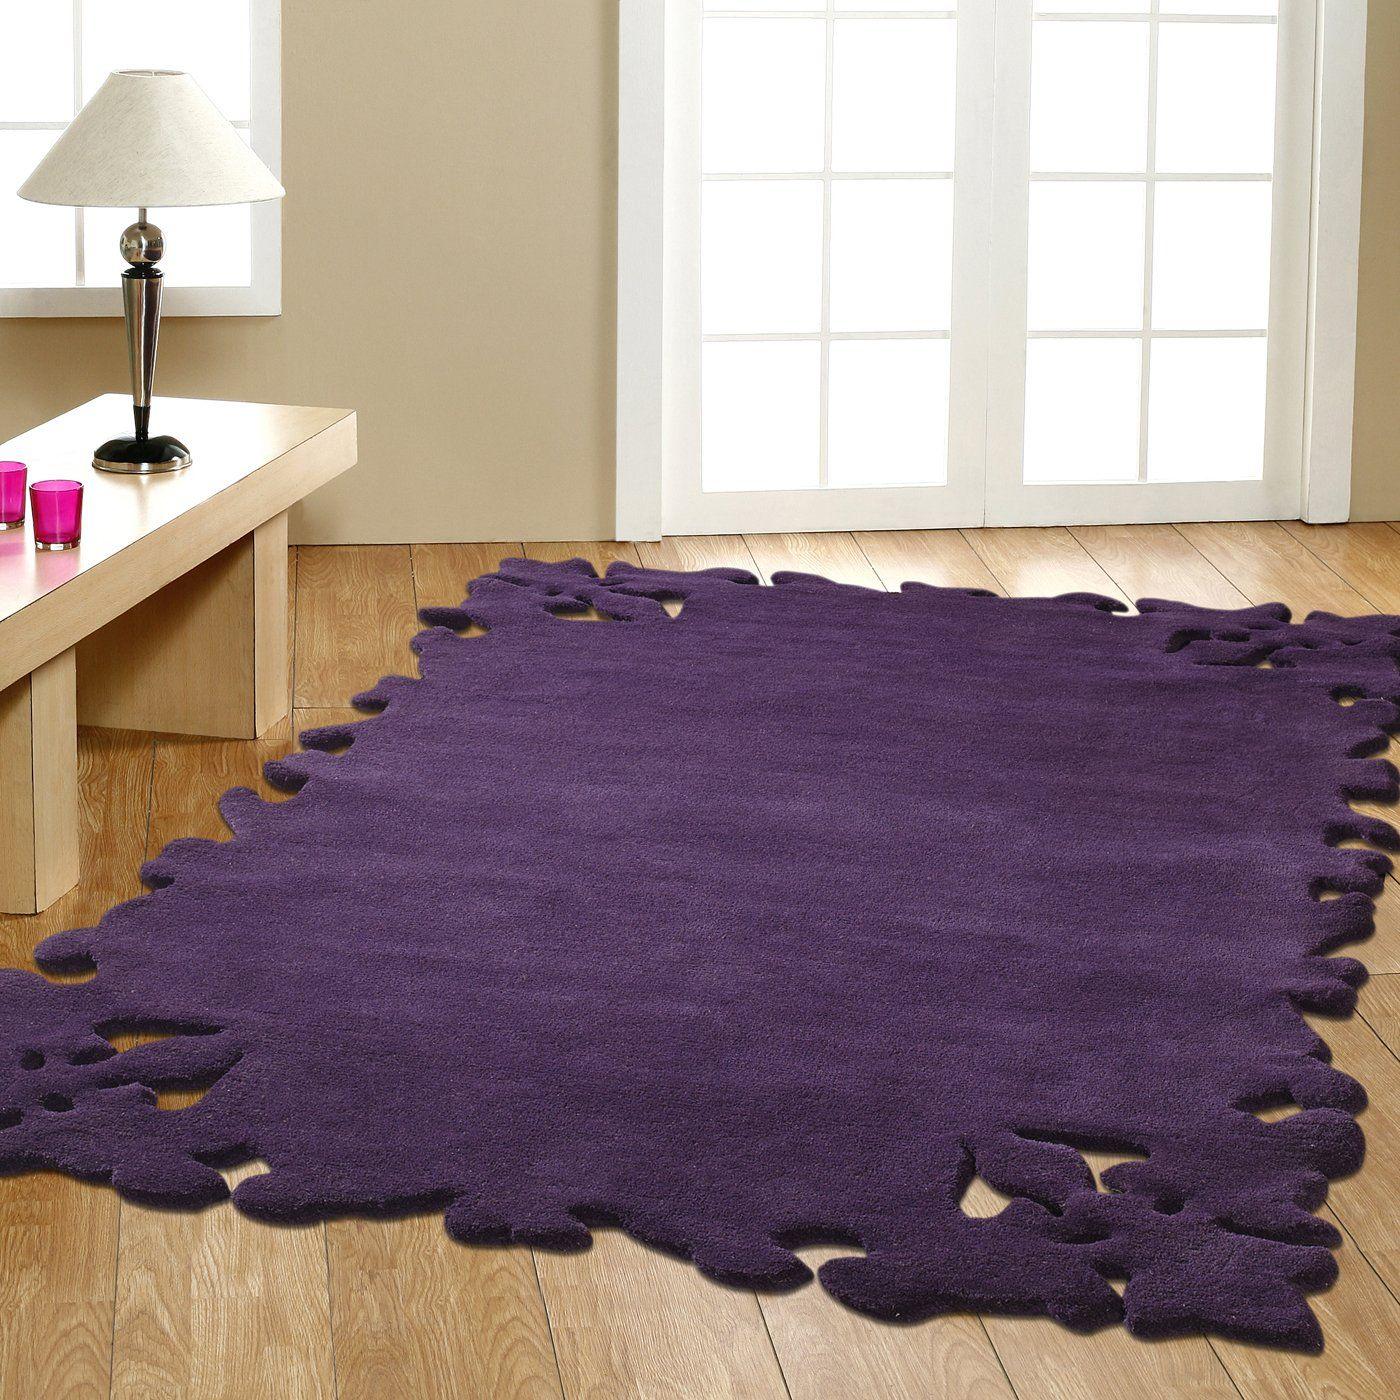 Modella Purple Area Rug For My Bedroom